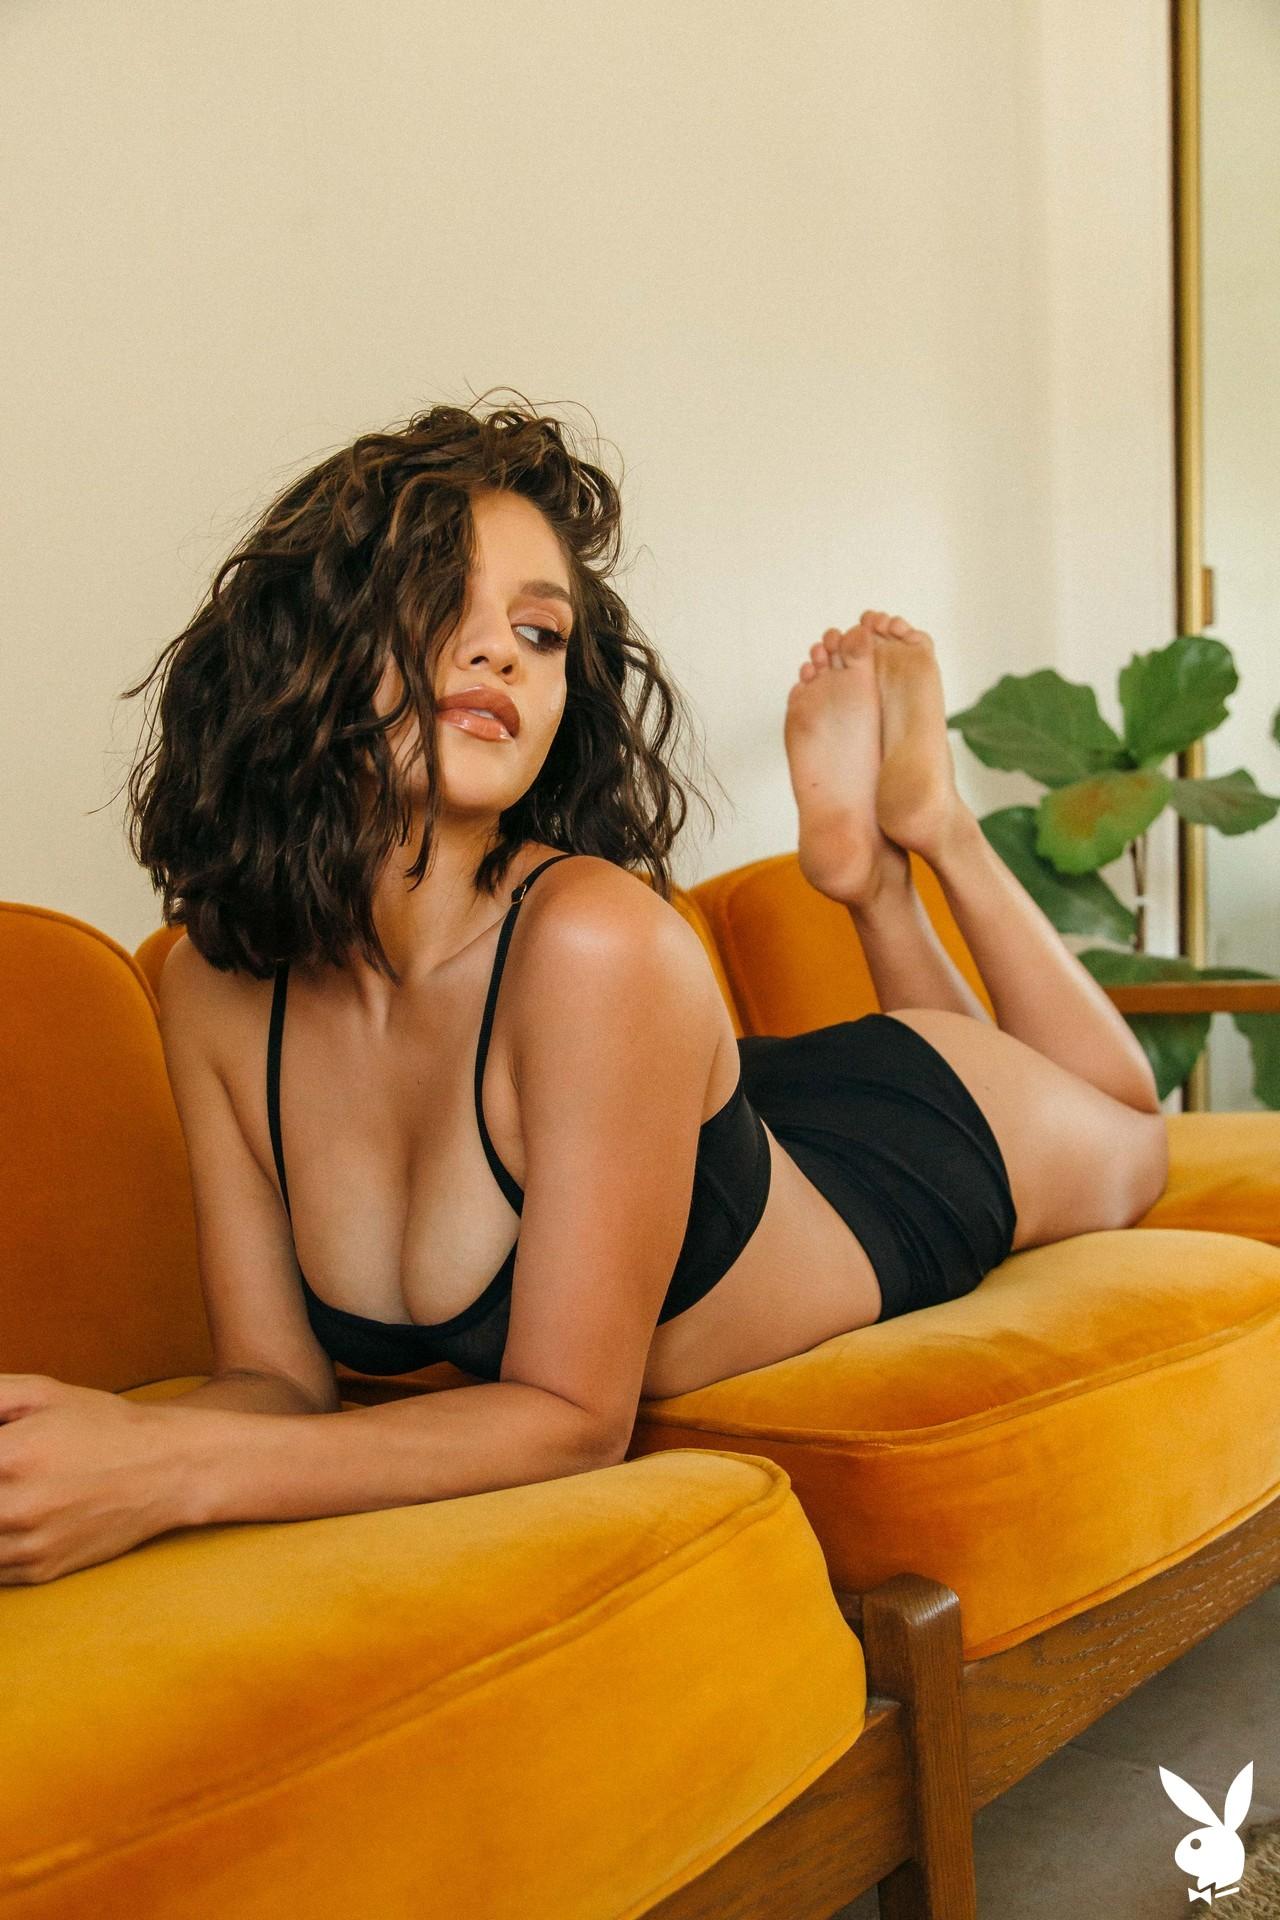 Natalie Del Real In The Simple Things Playboy Plus (8)